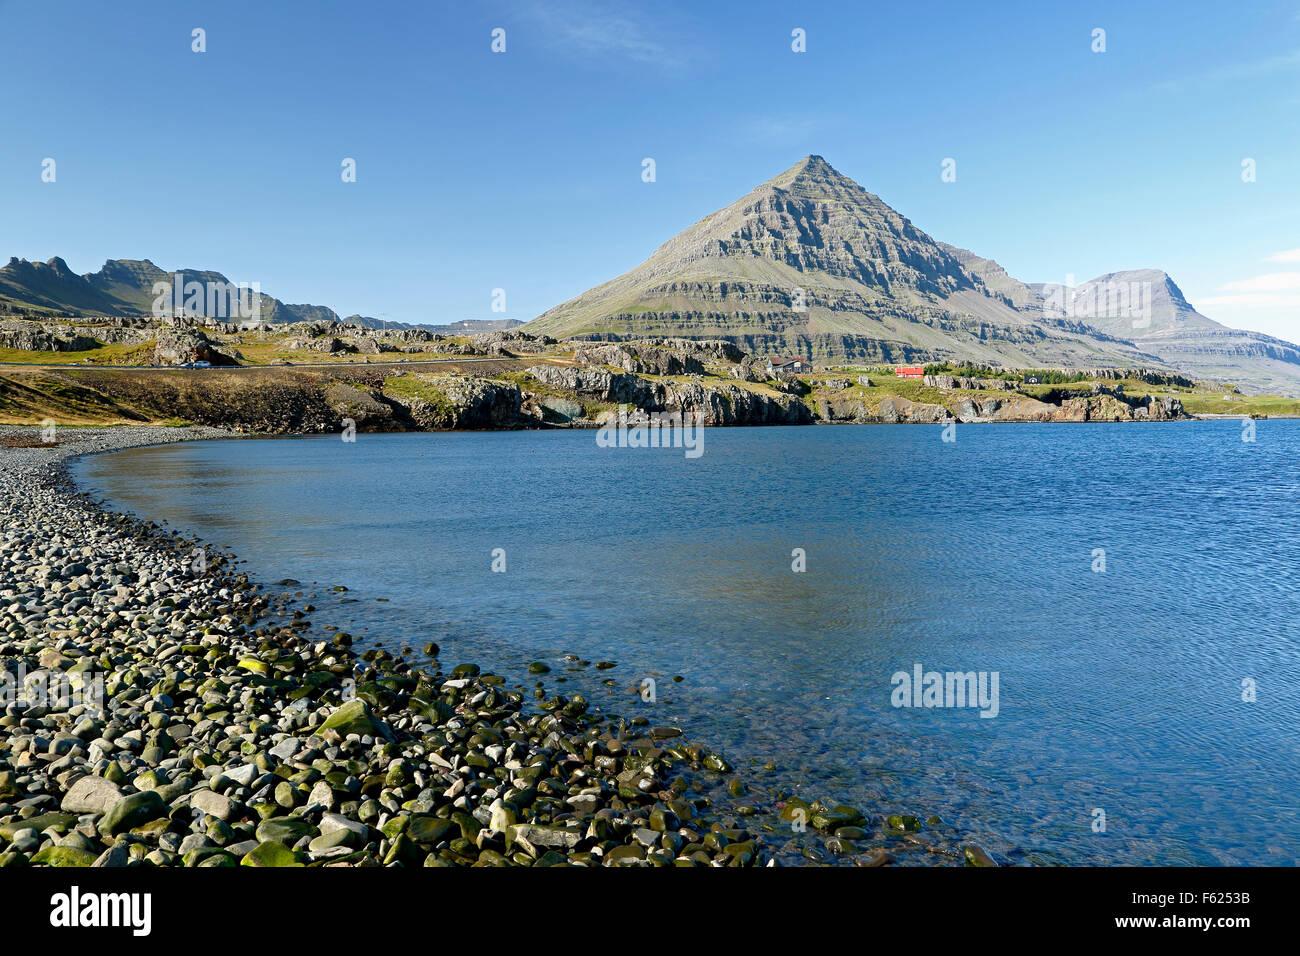 Bulandstindur Peak on Berufjordur Fjord, Route 1 (Ring Road), Iceland - Stock Image